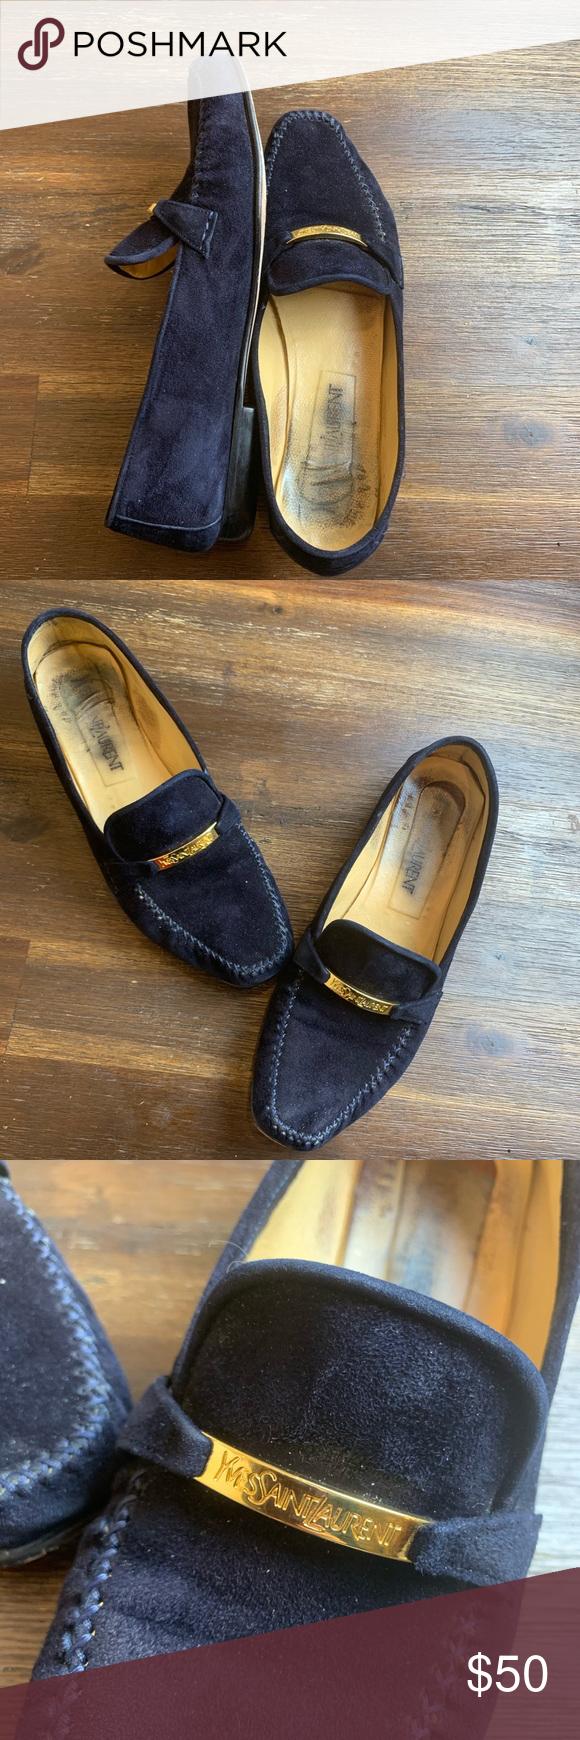 Vintage classic YSL flats shoes